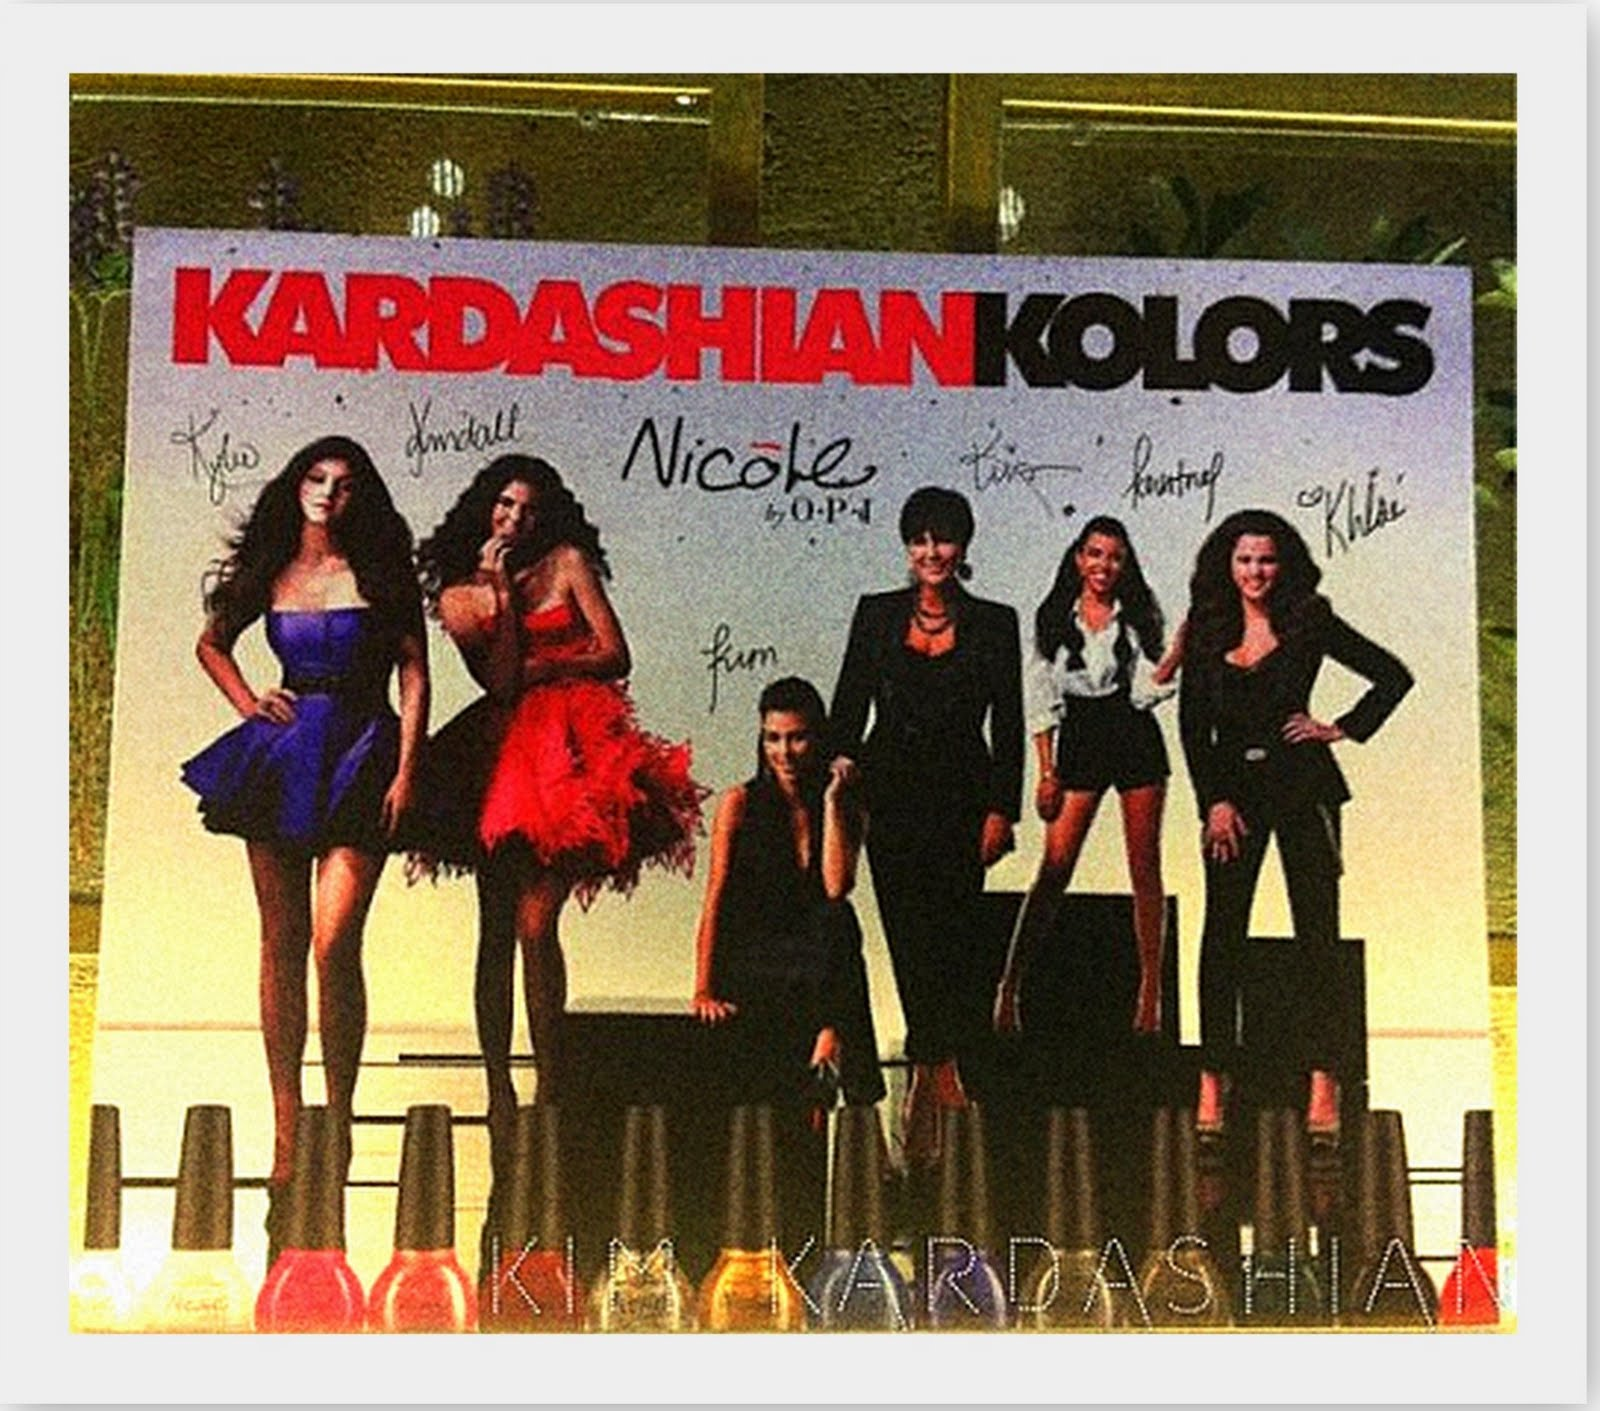 http://3.bp.blogspot.com/-jOnBU_5rboE/Th1CyG1747I/AAAAAAAABFQ/w0oXe5aikUw/s1600/Kardashian+Kolors1.jpg